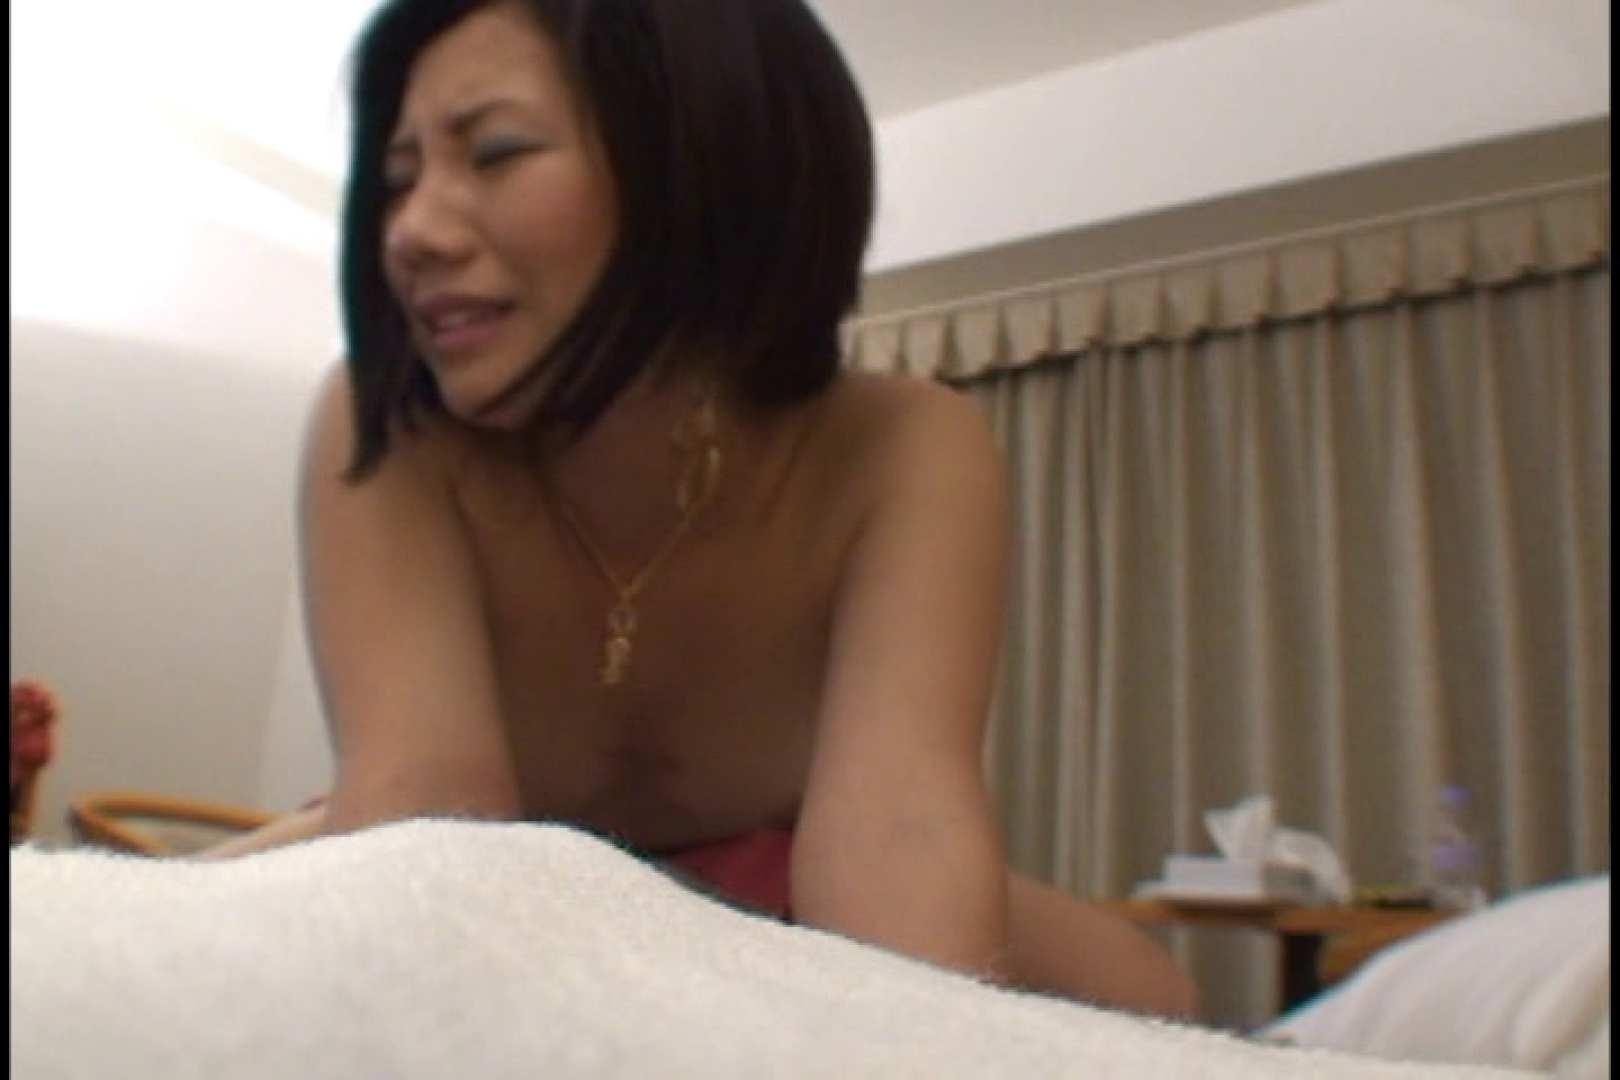 JDハンター全国ツアー vol.008 後編 女子大生 | 0  62画像 8